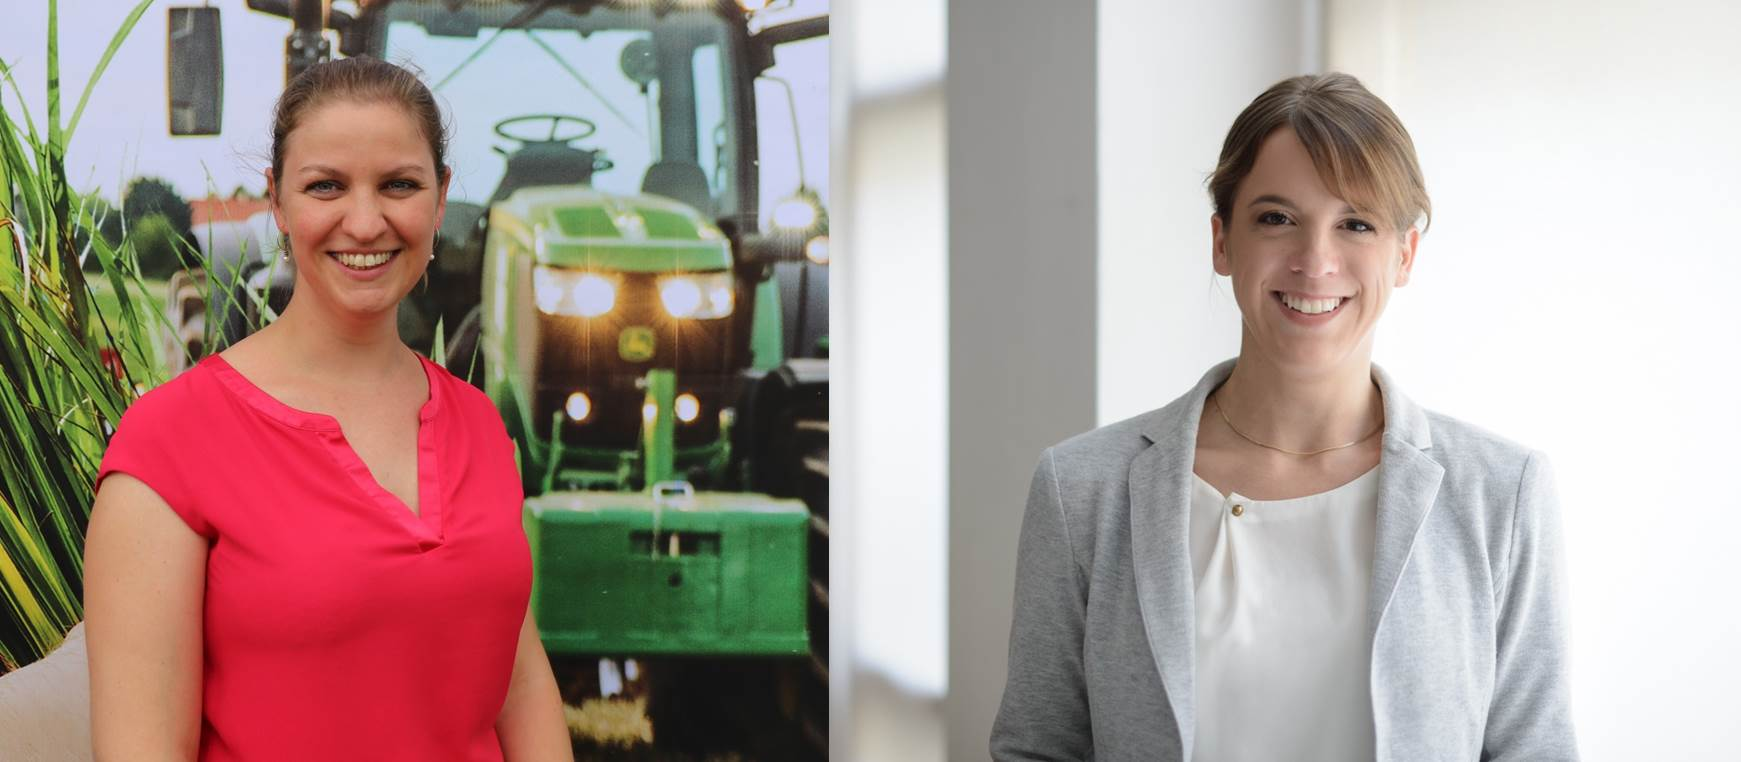 Janina Effelsberg und Sabrina Leibrecht